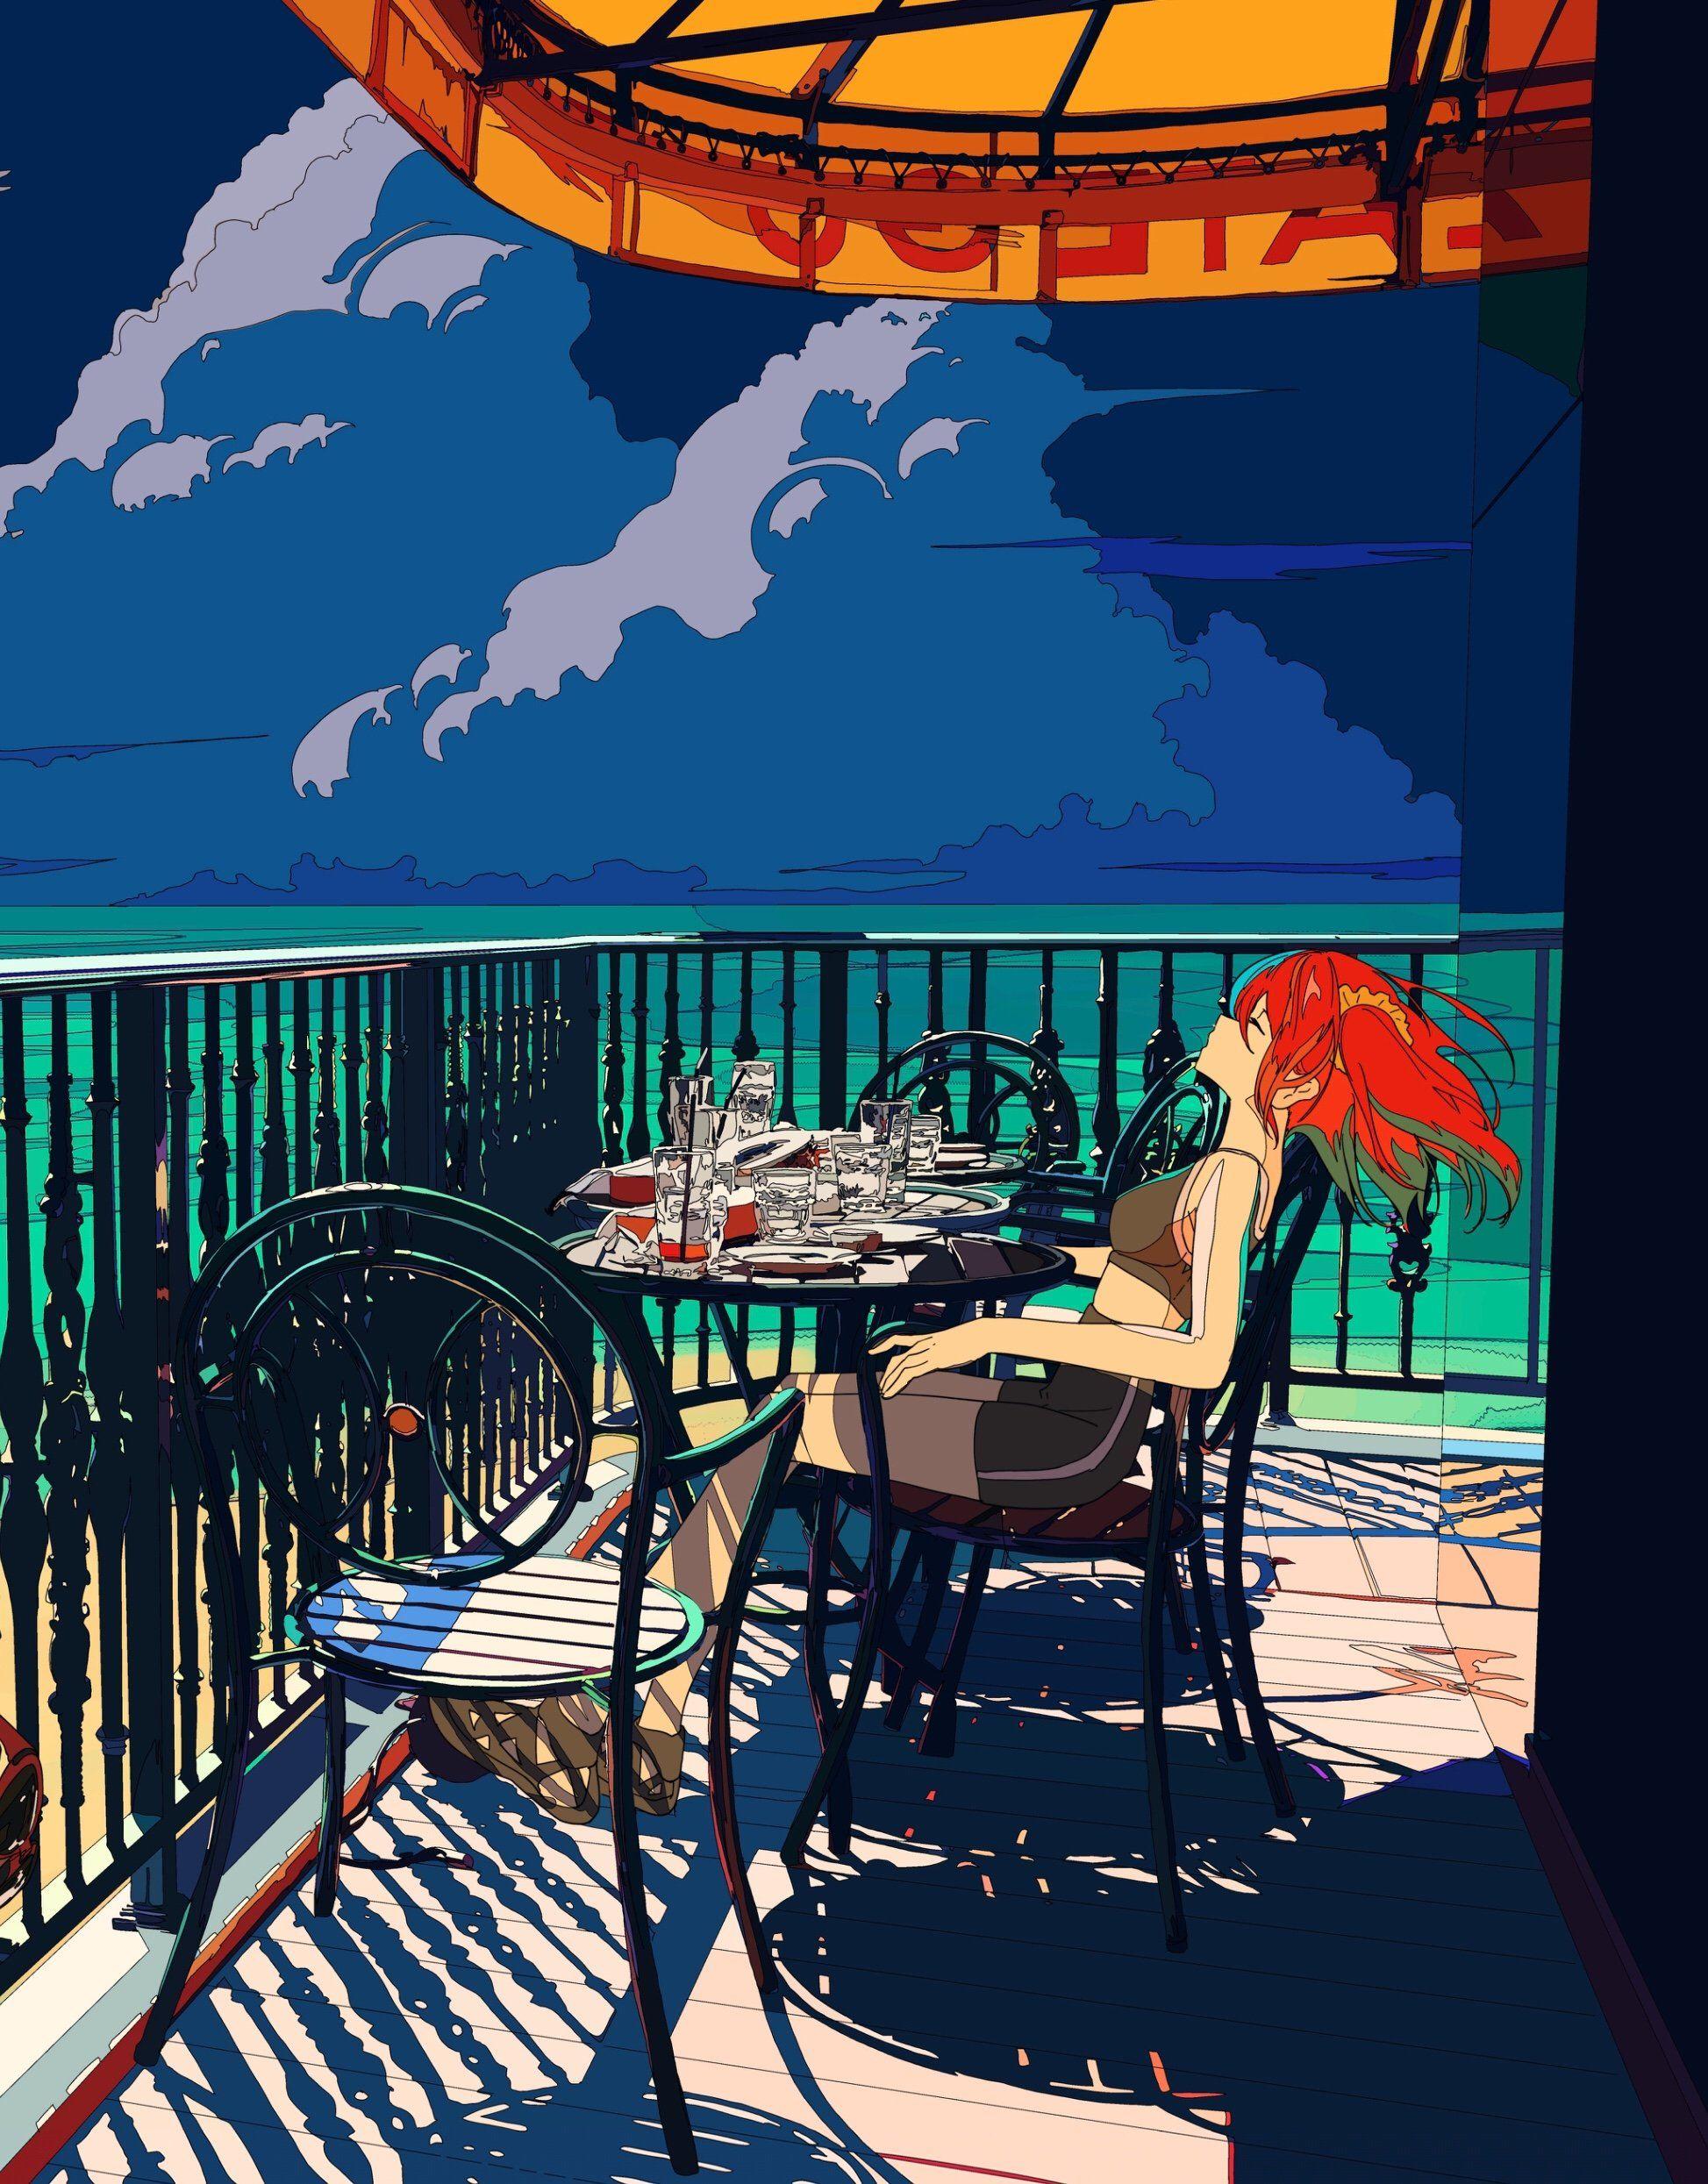 Summer, 焦茶(BARD713), Digital, 2018 Art イラスト, 絵, アニメファンアート